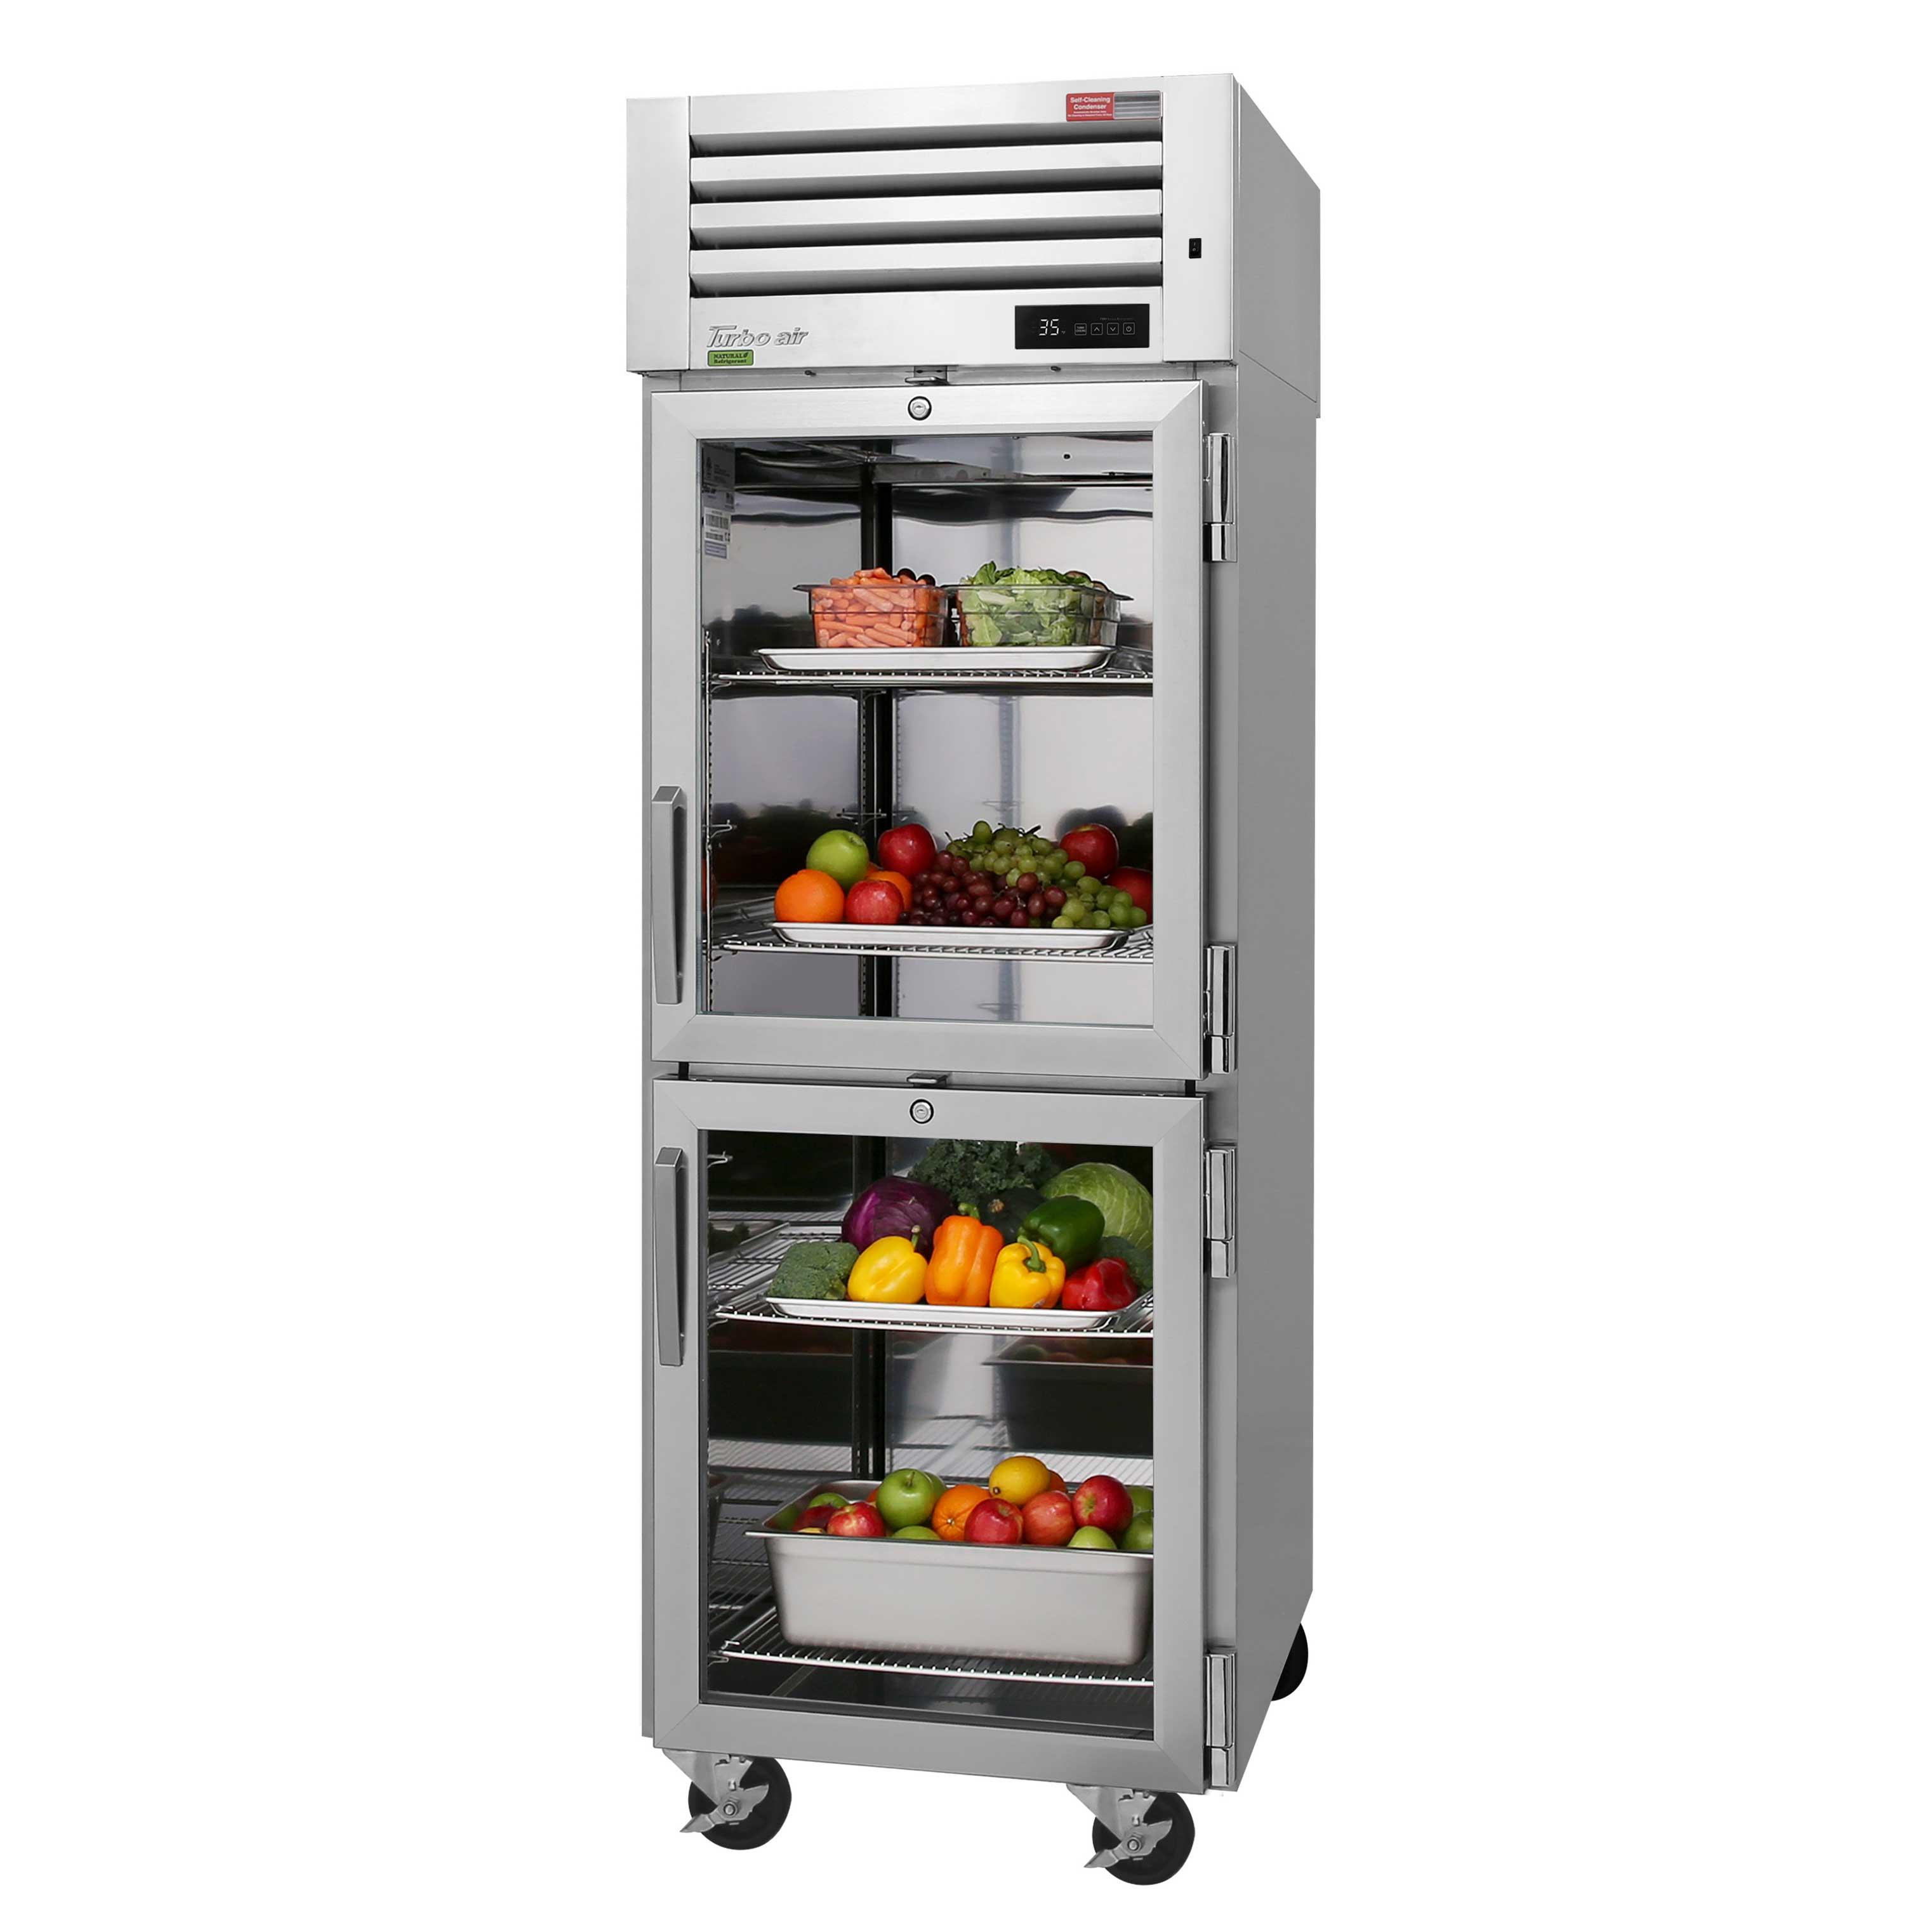 Turbo Air PRO-26-2R-G-PT-N refrigerator, pass-thru